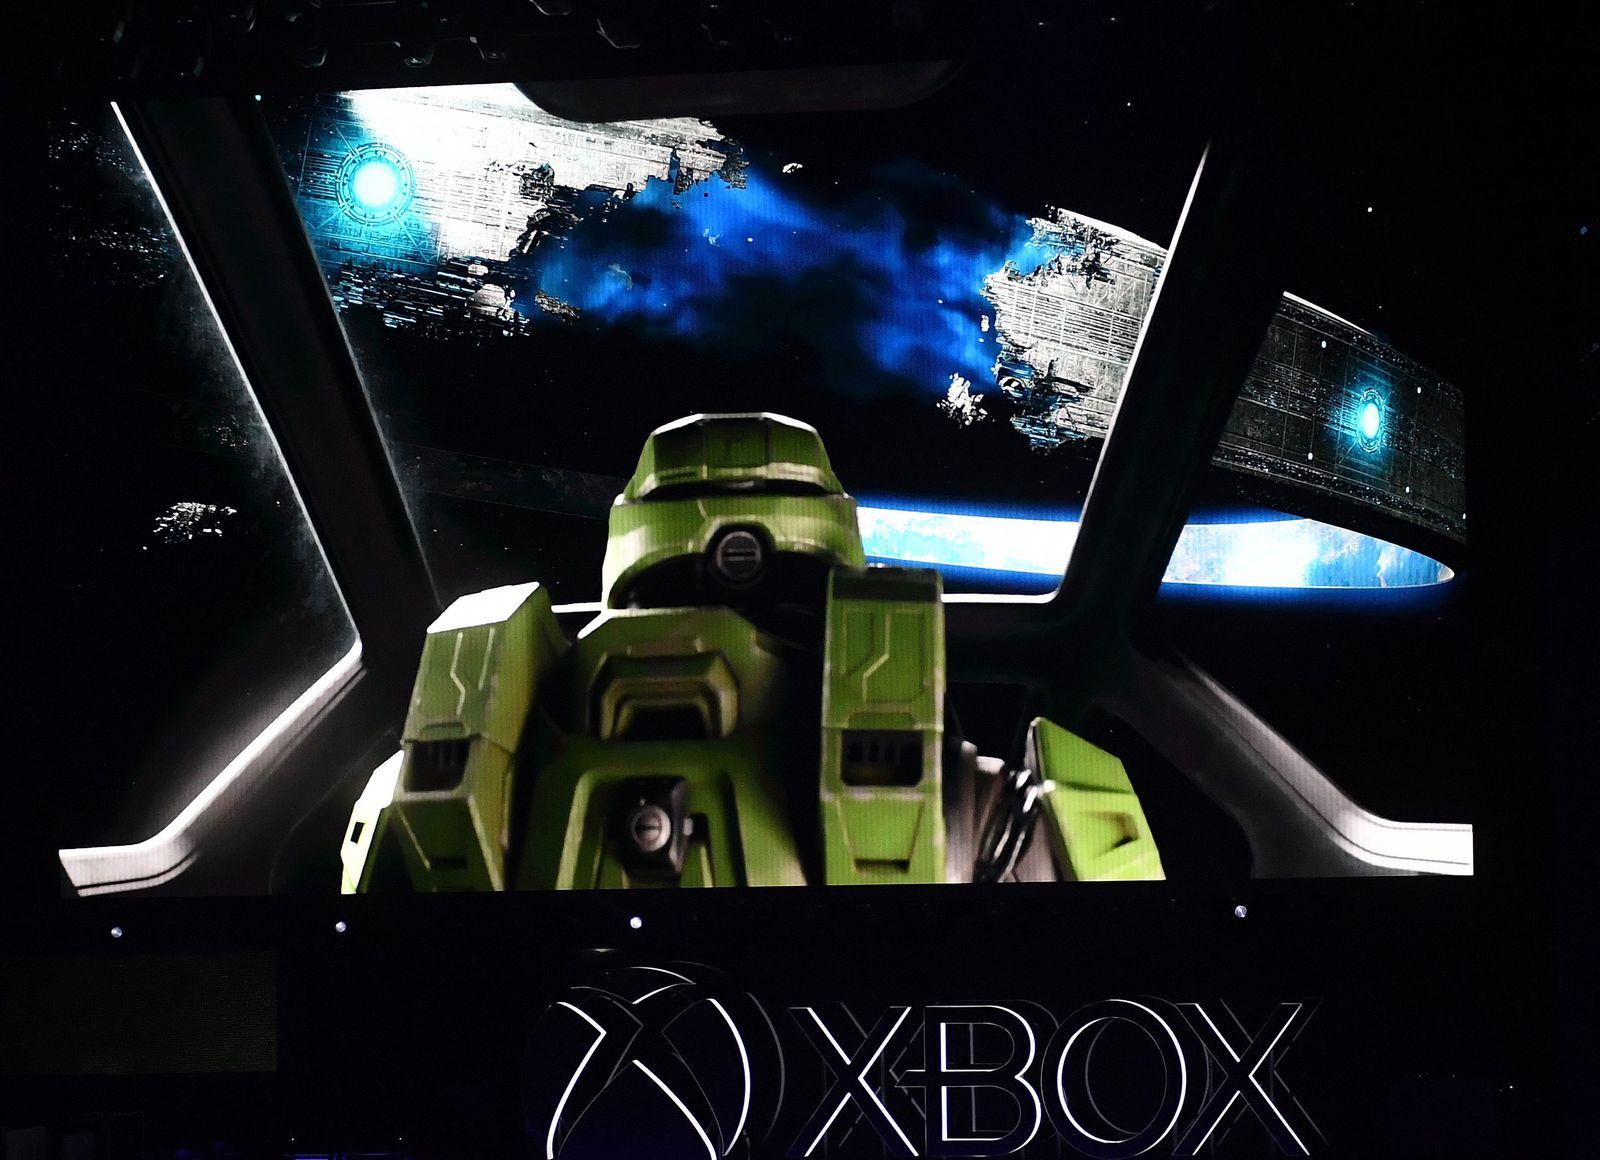 US-INTERNET-GAMES-COMPUTERS-MICROSOFT-XBOX